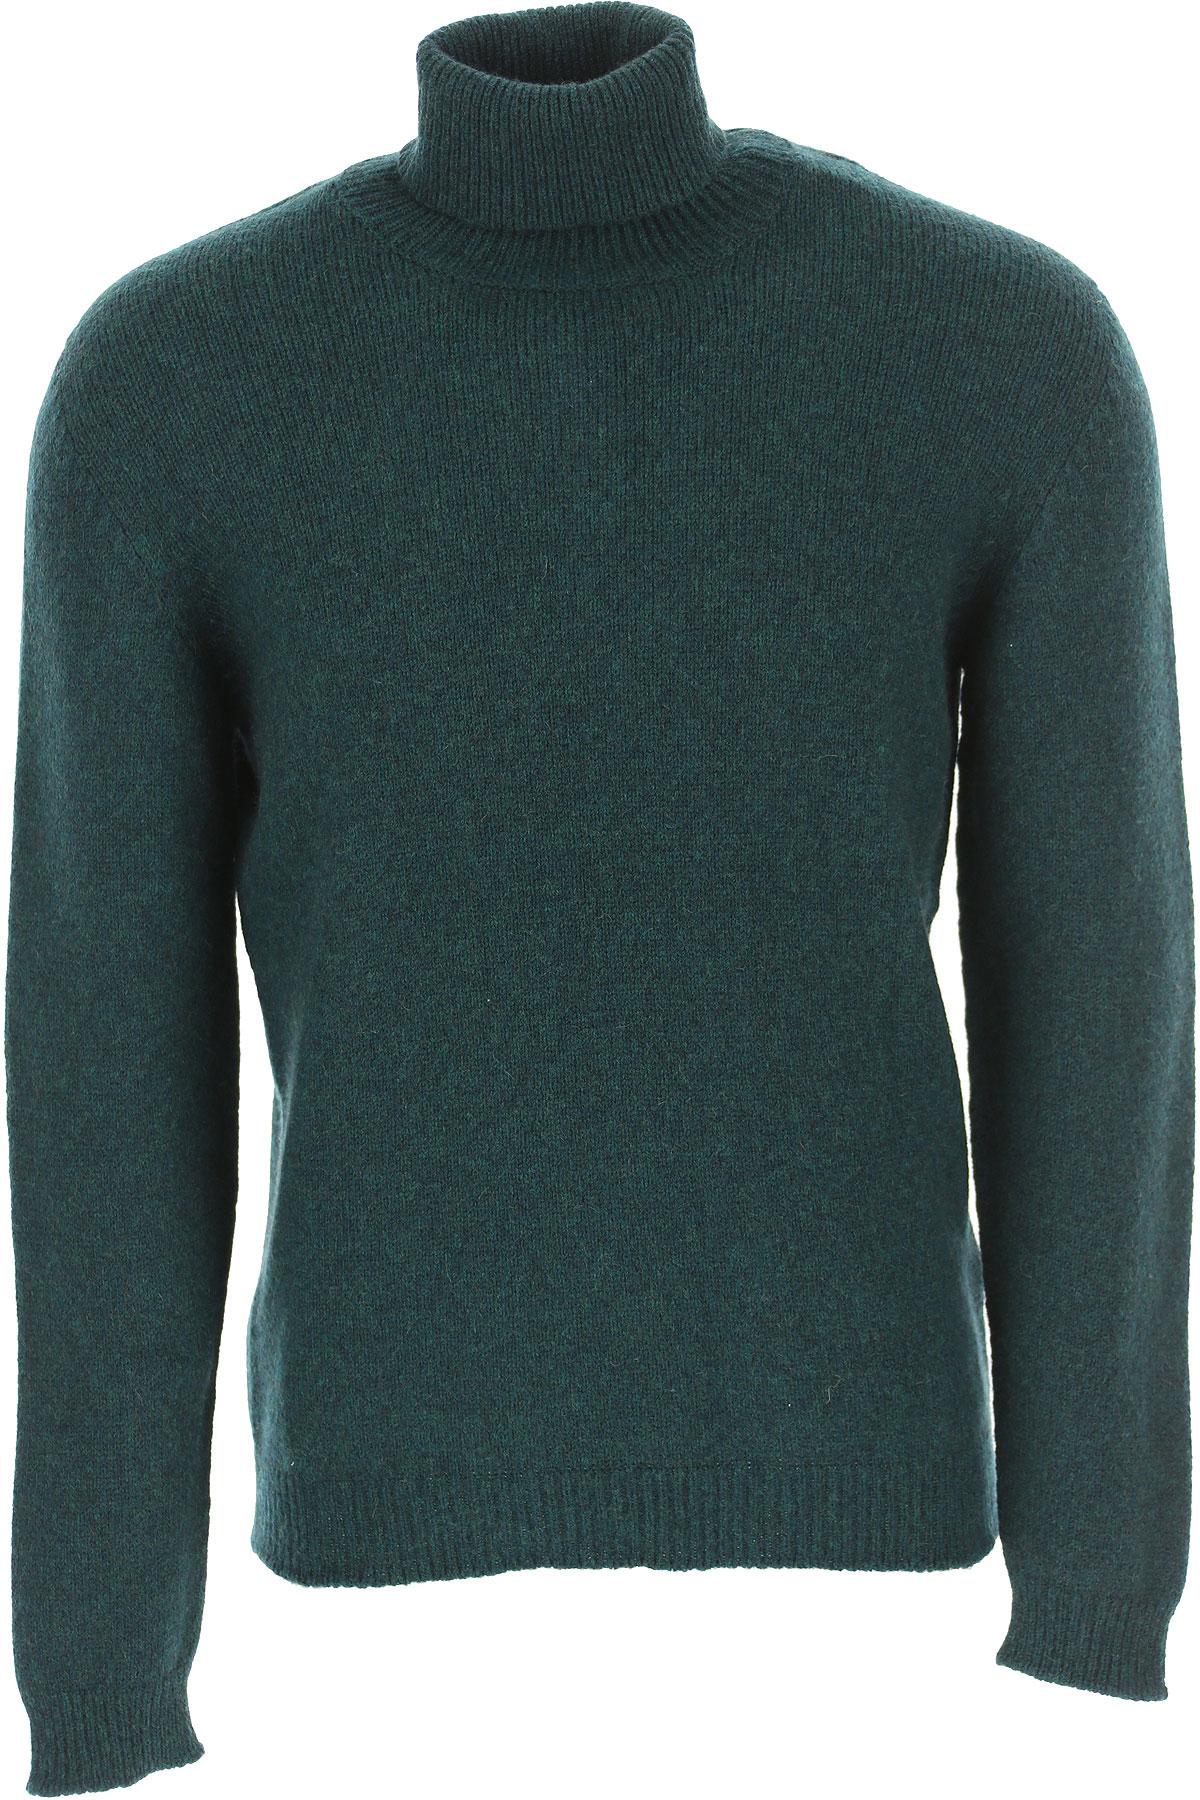 Kangra Sweater for Men Jumper On Sale, Bottle Green, Wool, 2019, S XL